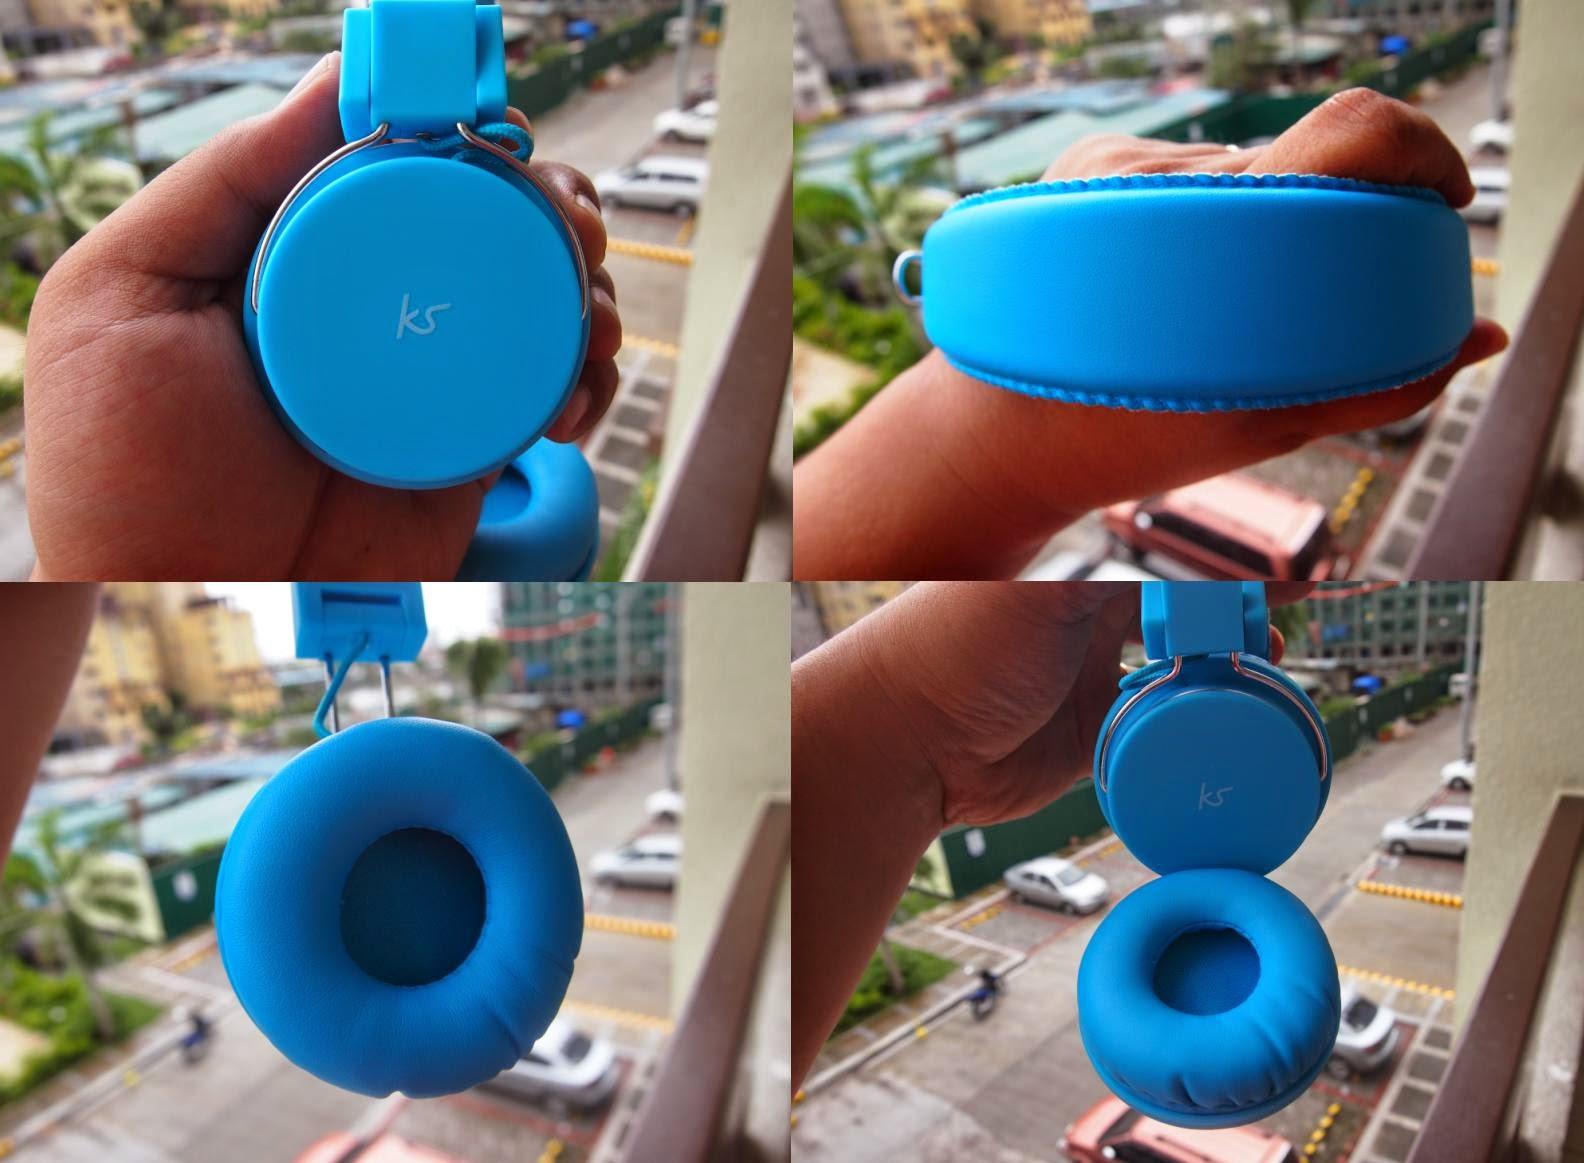 Kitsound Manhattan Wireless Headphone Review: From UK to NY